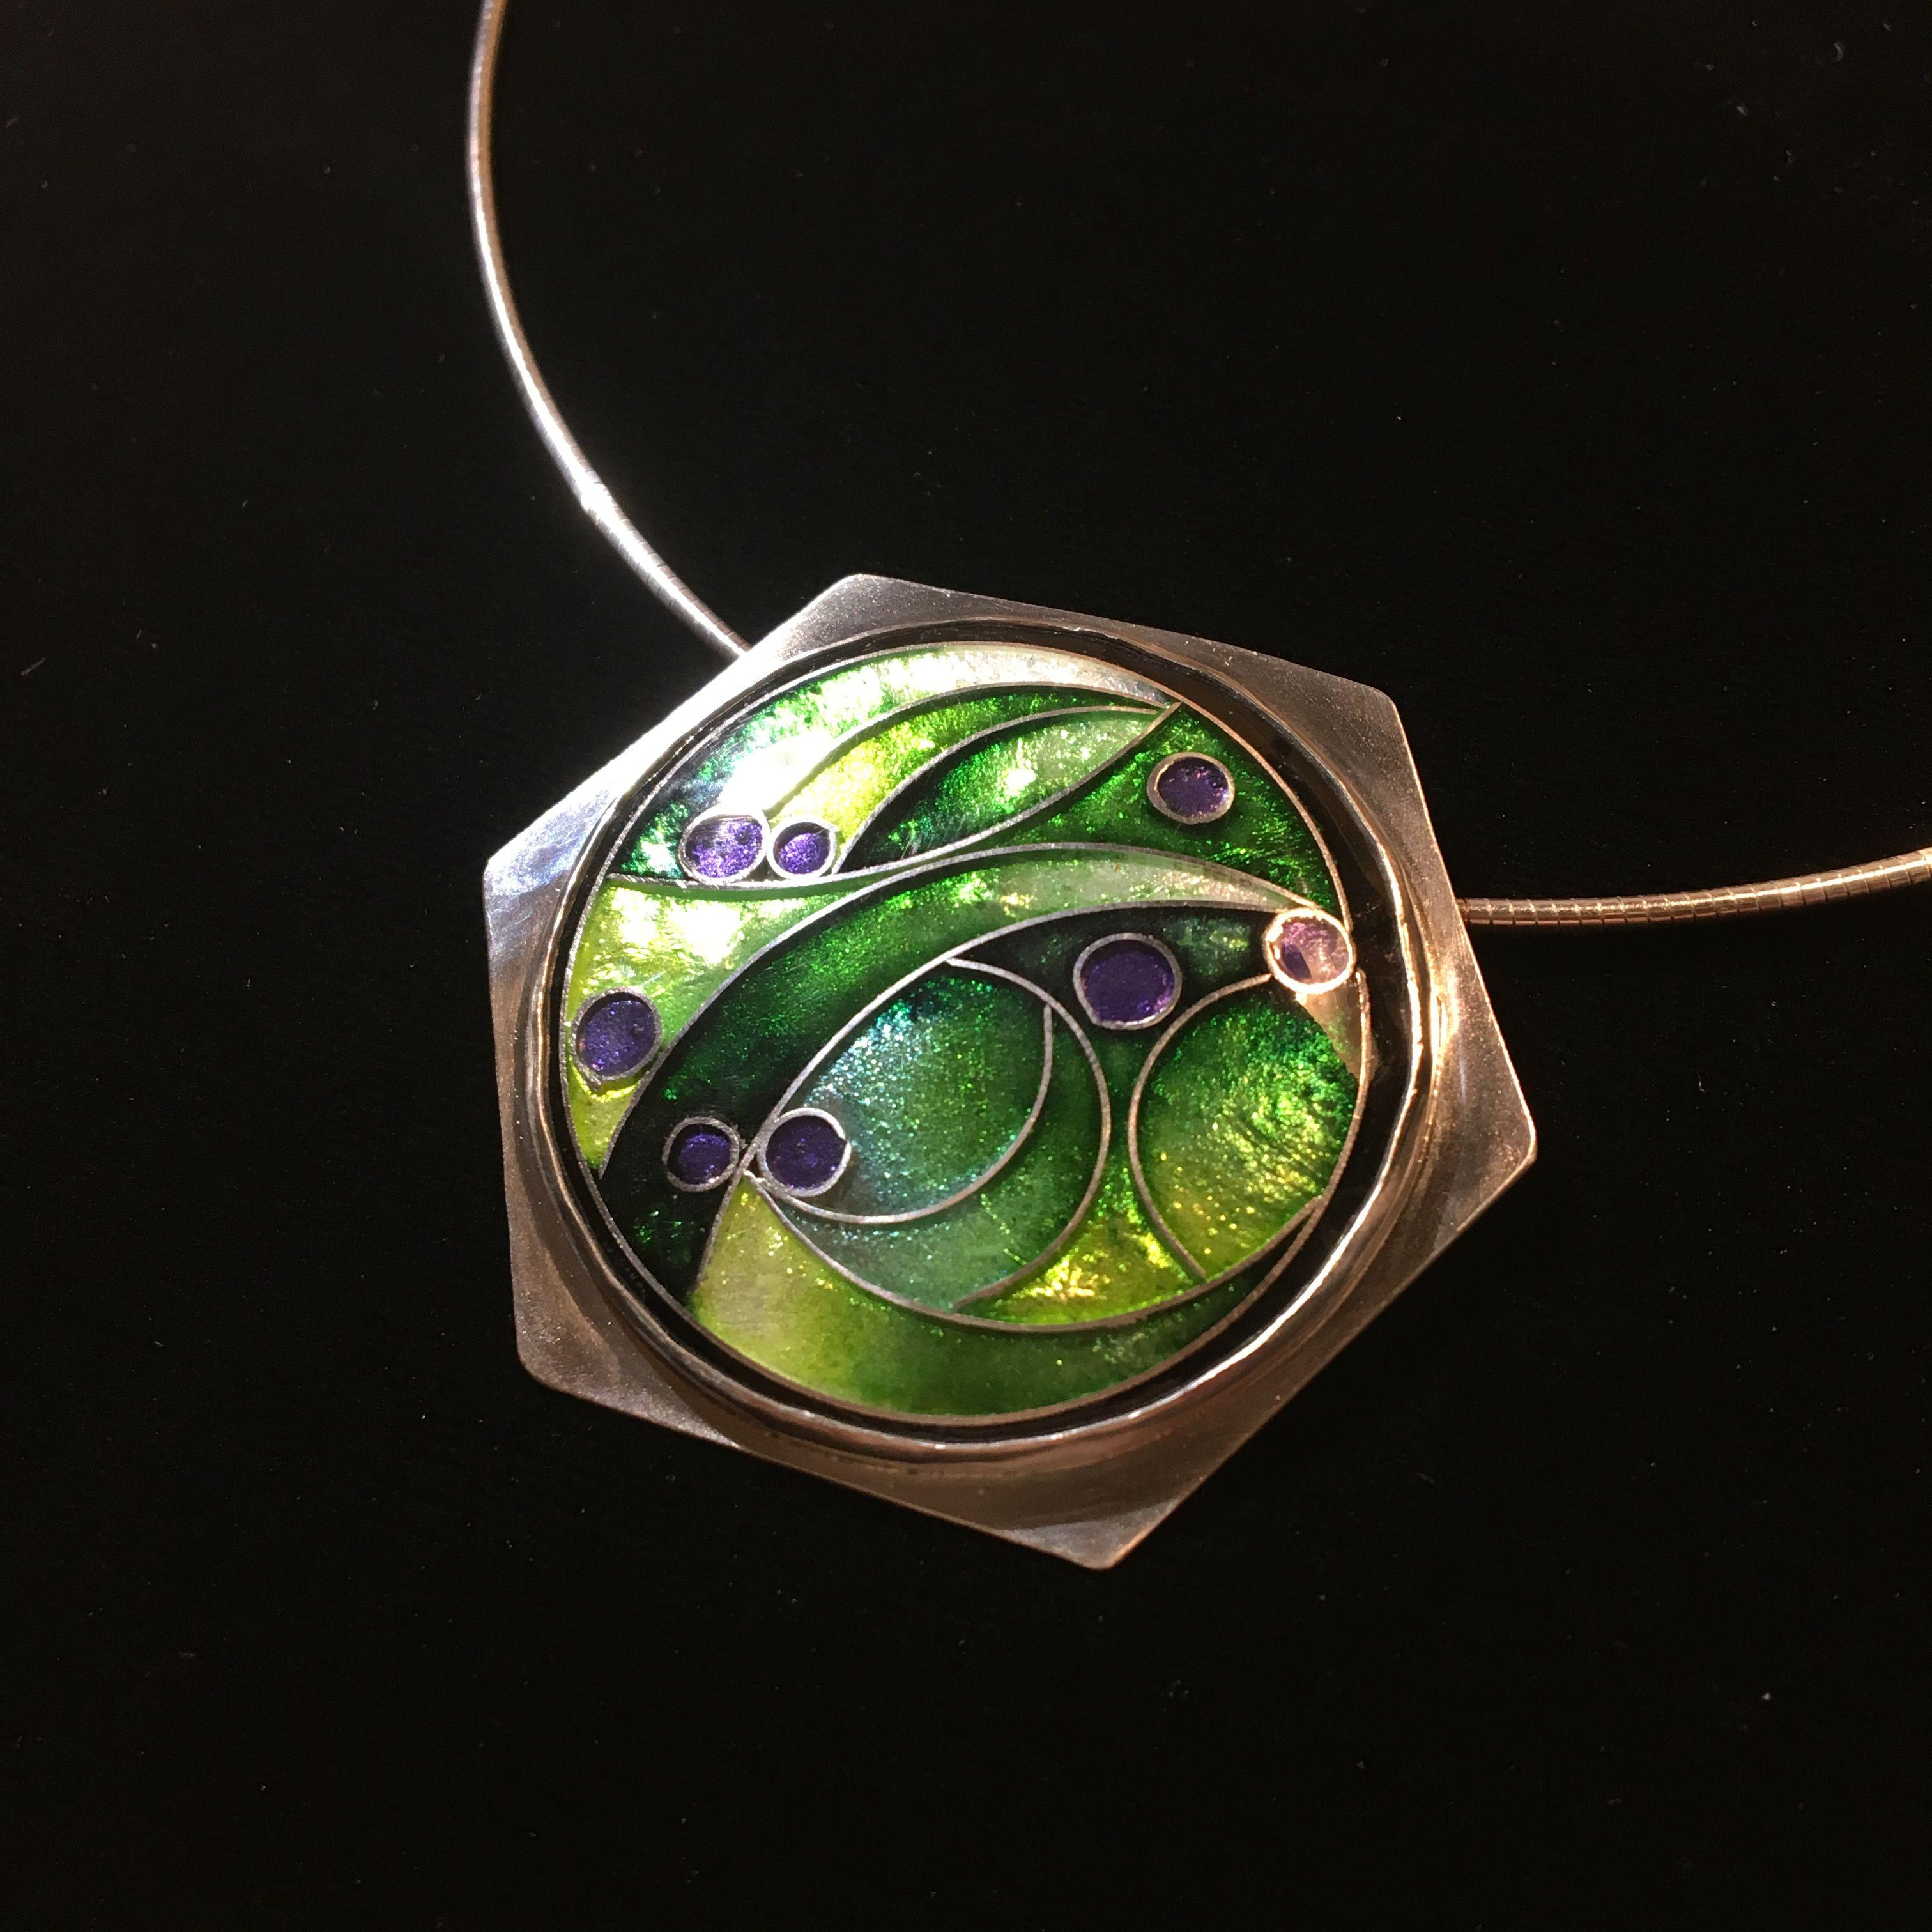 Cloisonné enamel pendant set in sterling silver